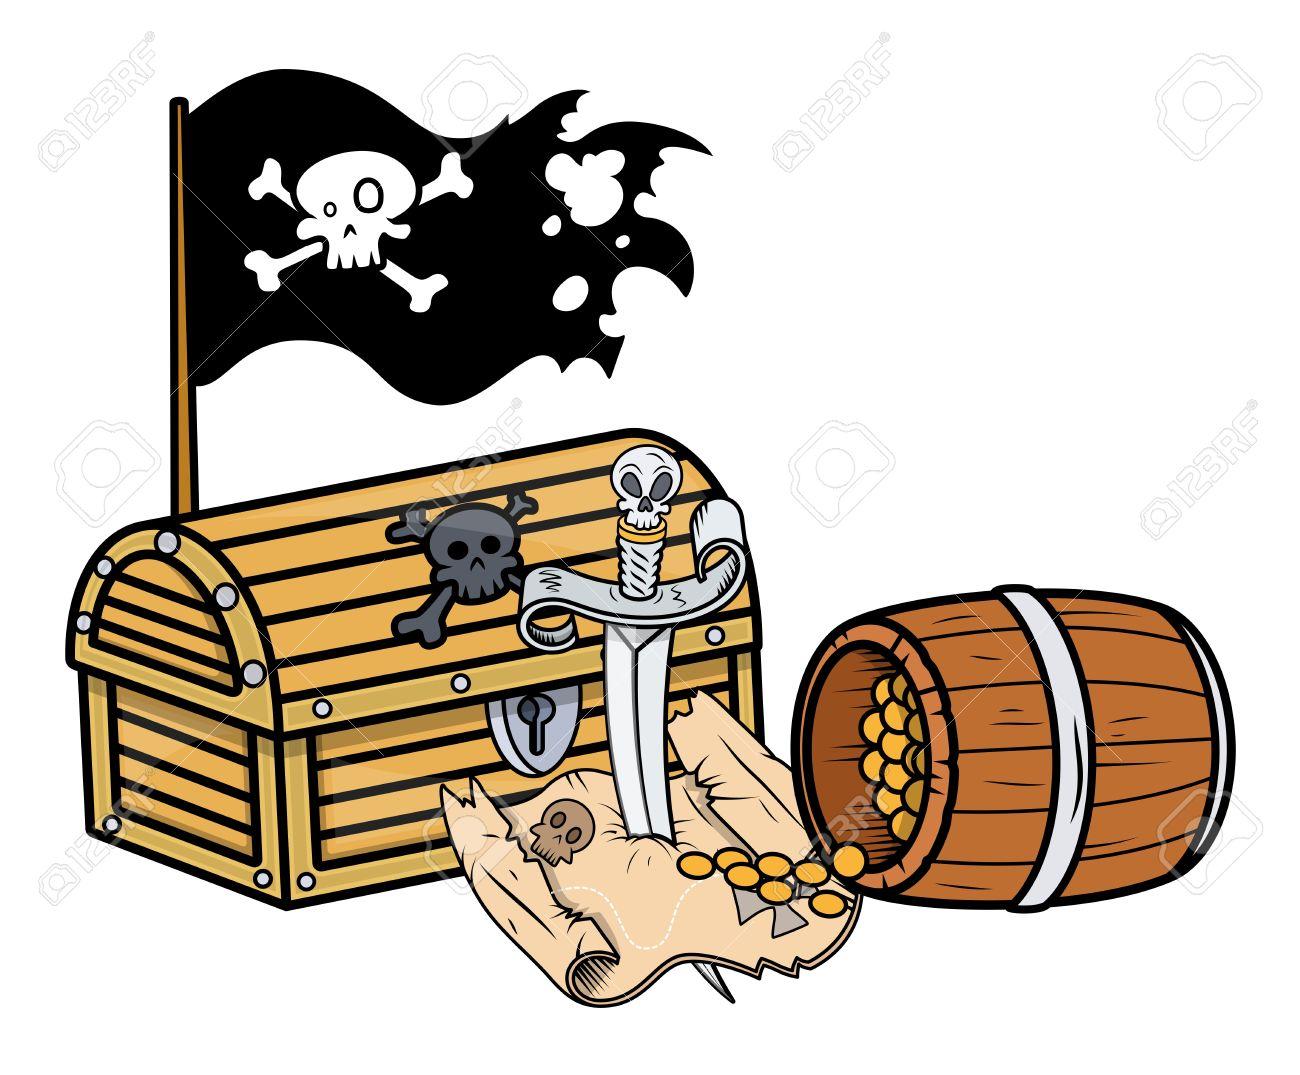 pirate treasure - Vector Cartoon Illustration Stock Vector - 21505811